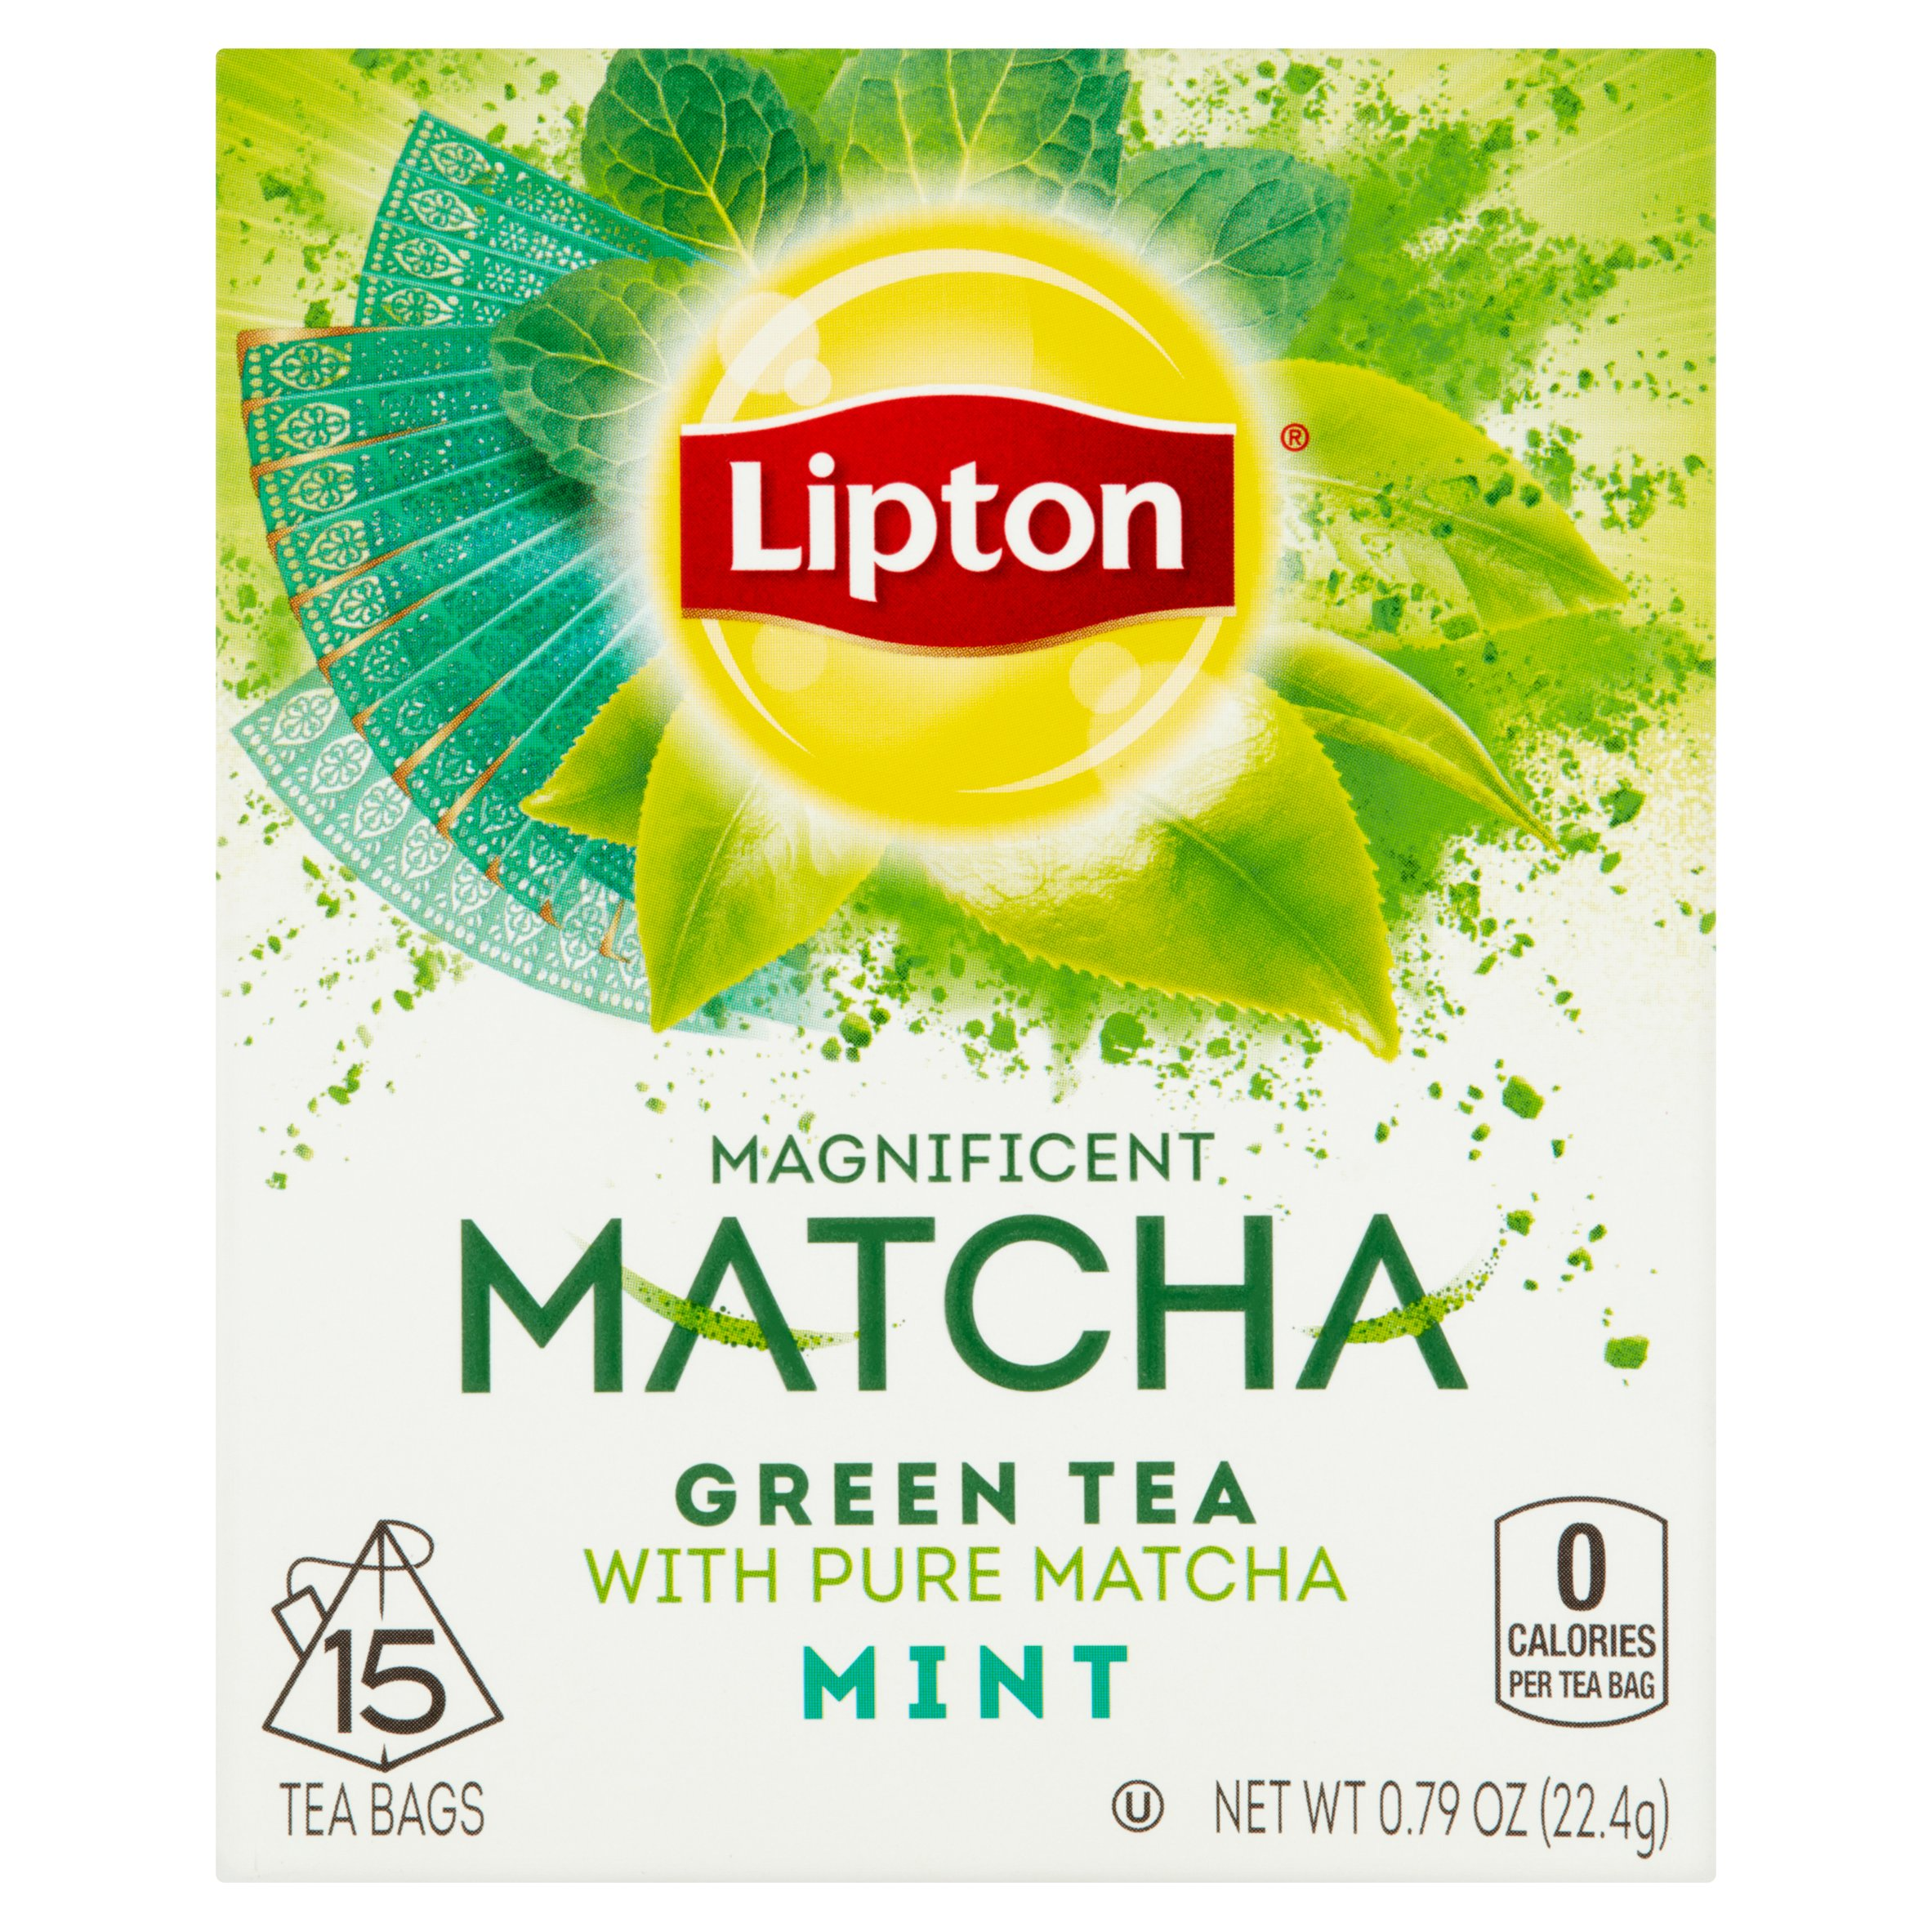 (3 Pack) Lipton Magnificent Matcha Green Tea Bags Mint 15 ct